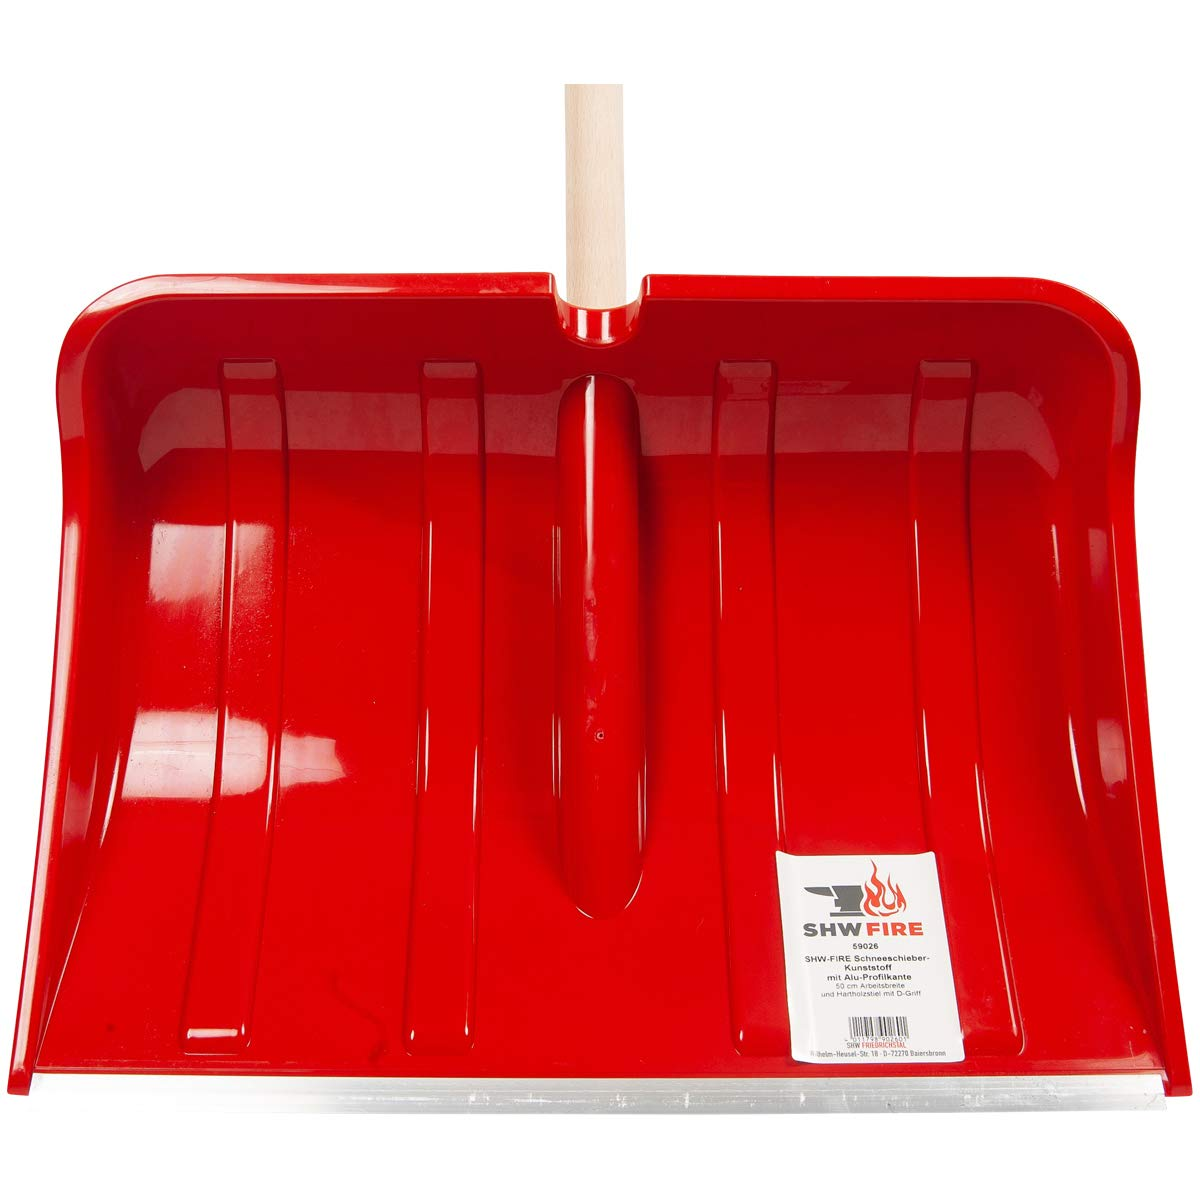 SHW-FIRE 59025 Schneeschieber Schneeschaufel Holz Kunststoffblatt 50 cm breit mit rundem Stiel 110 cm lang